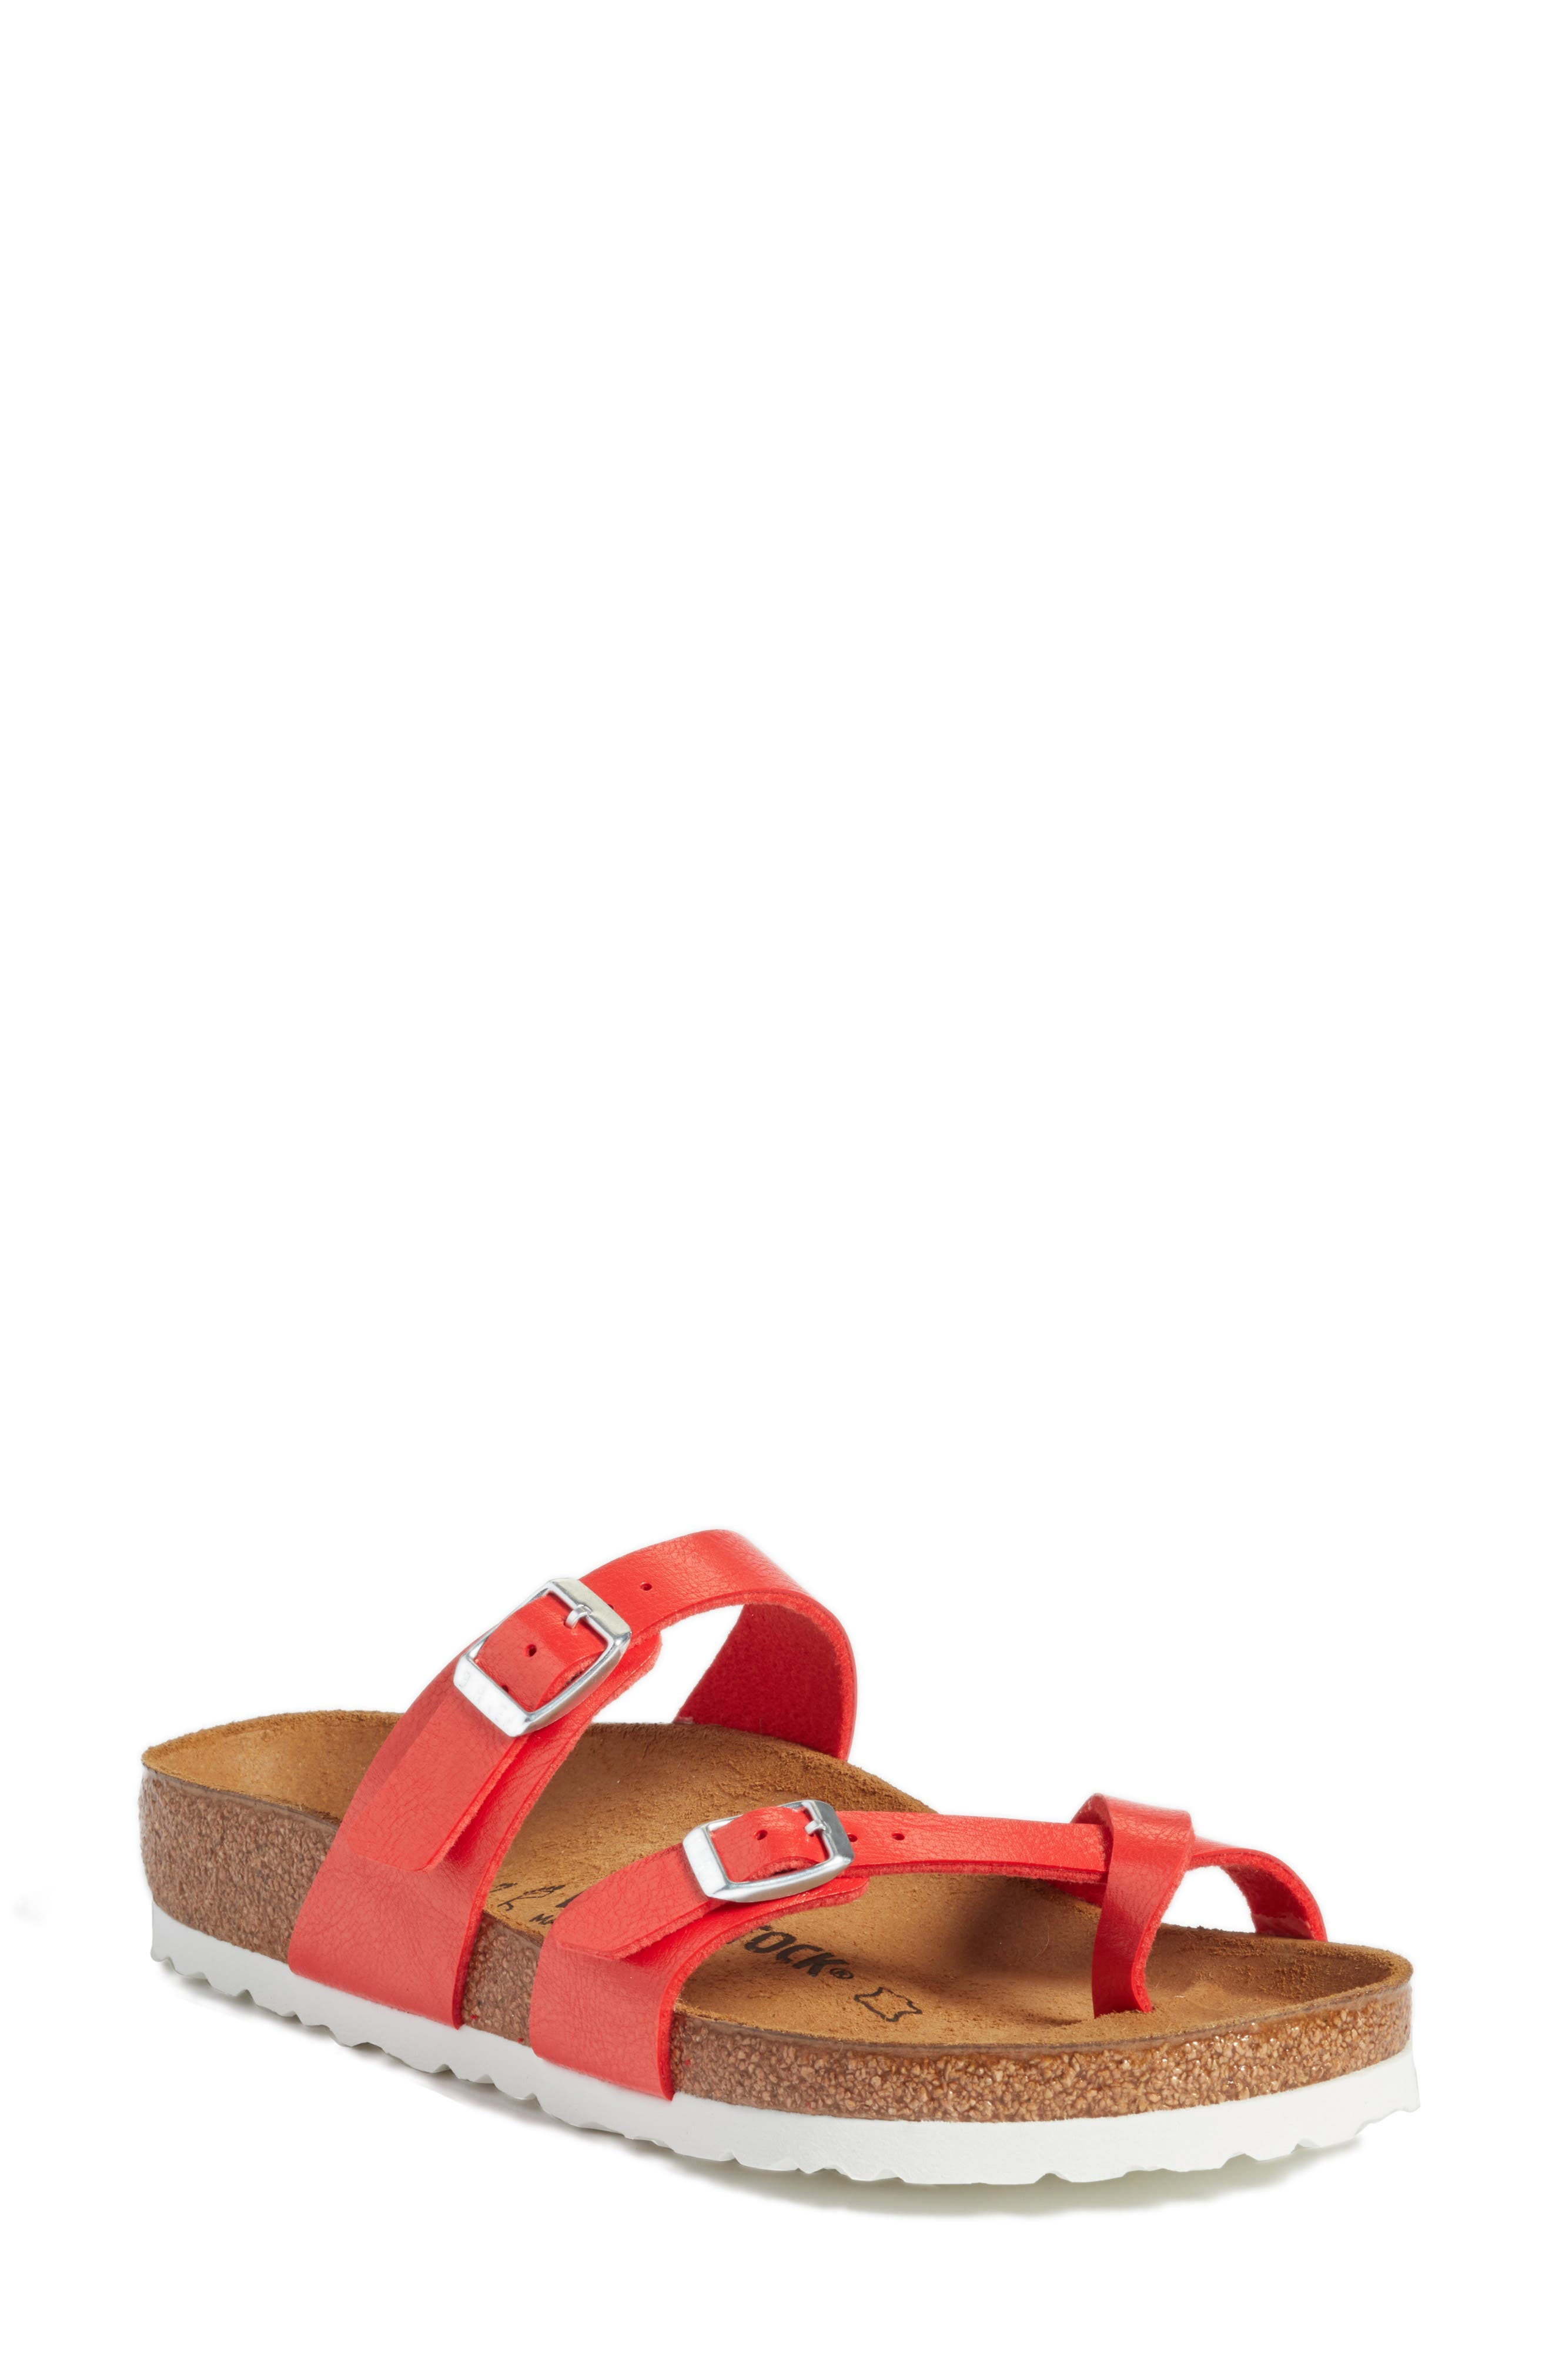 'Mayari' Birko-Flor<sup>™</sup> Sandal,                             Main thumbnail 15, color,